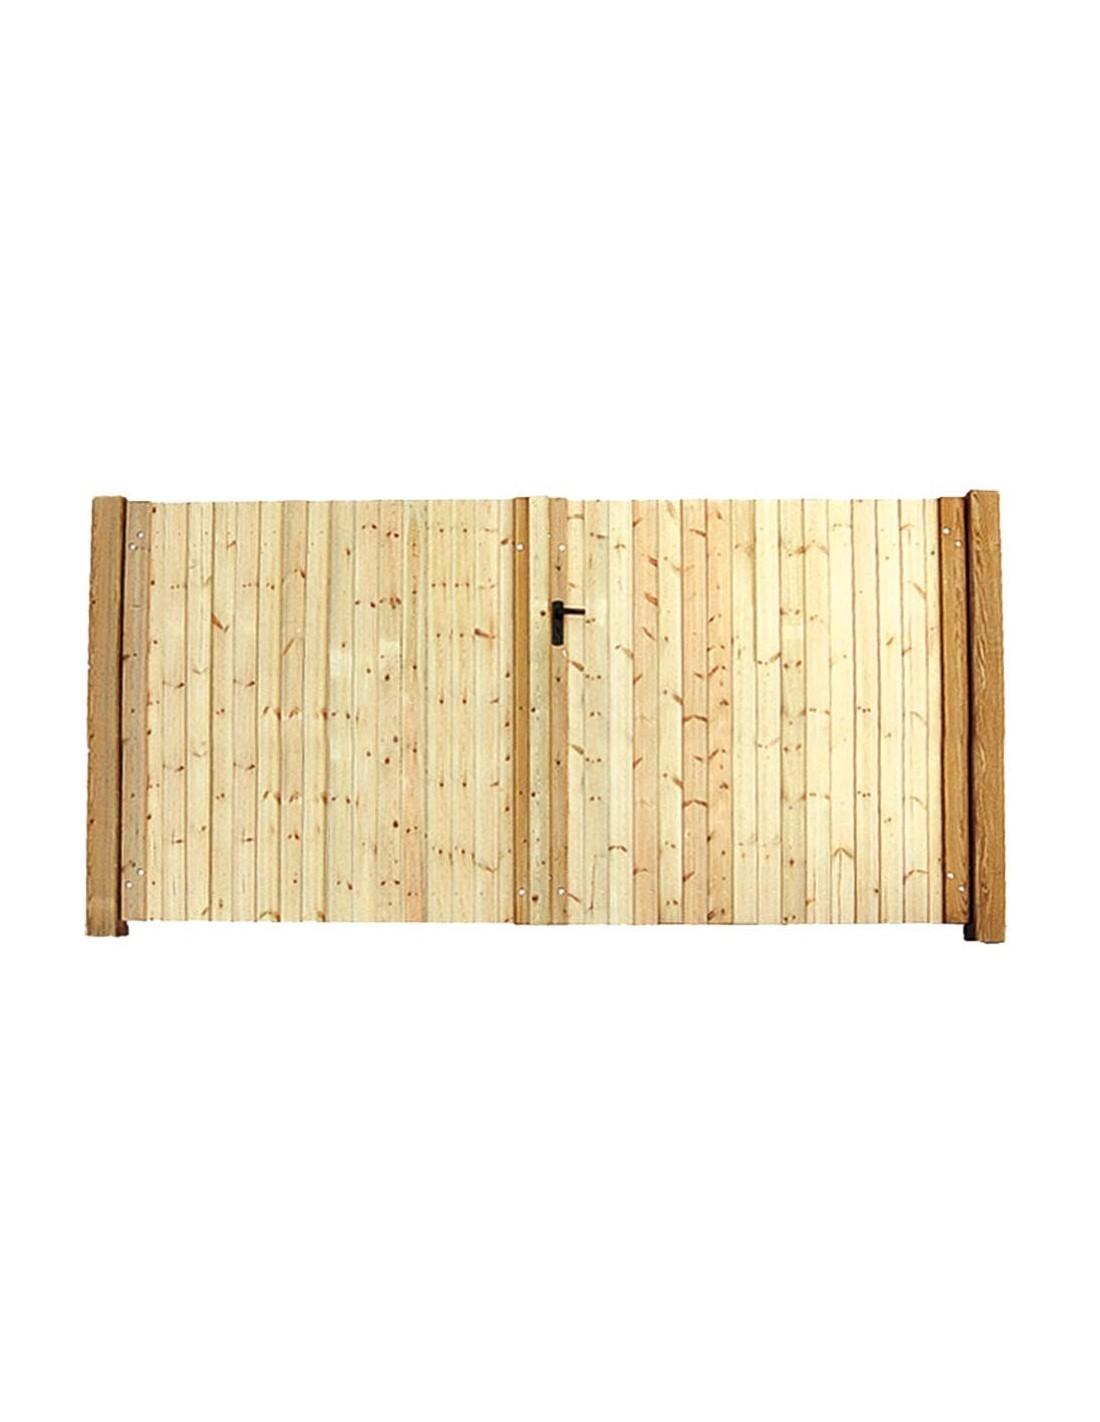 planche canadienne srn 19x150 200mm van wetter shop. Black Bedroom Furniture Sets. Home Design Ideas